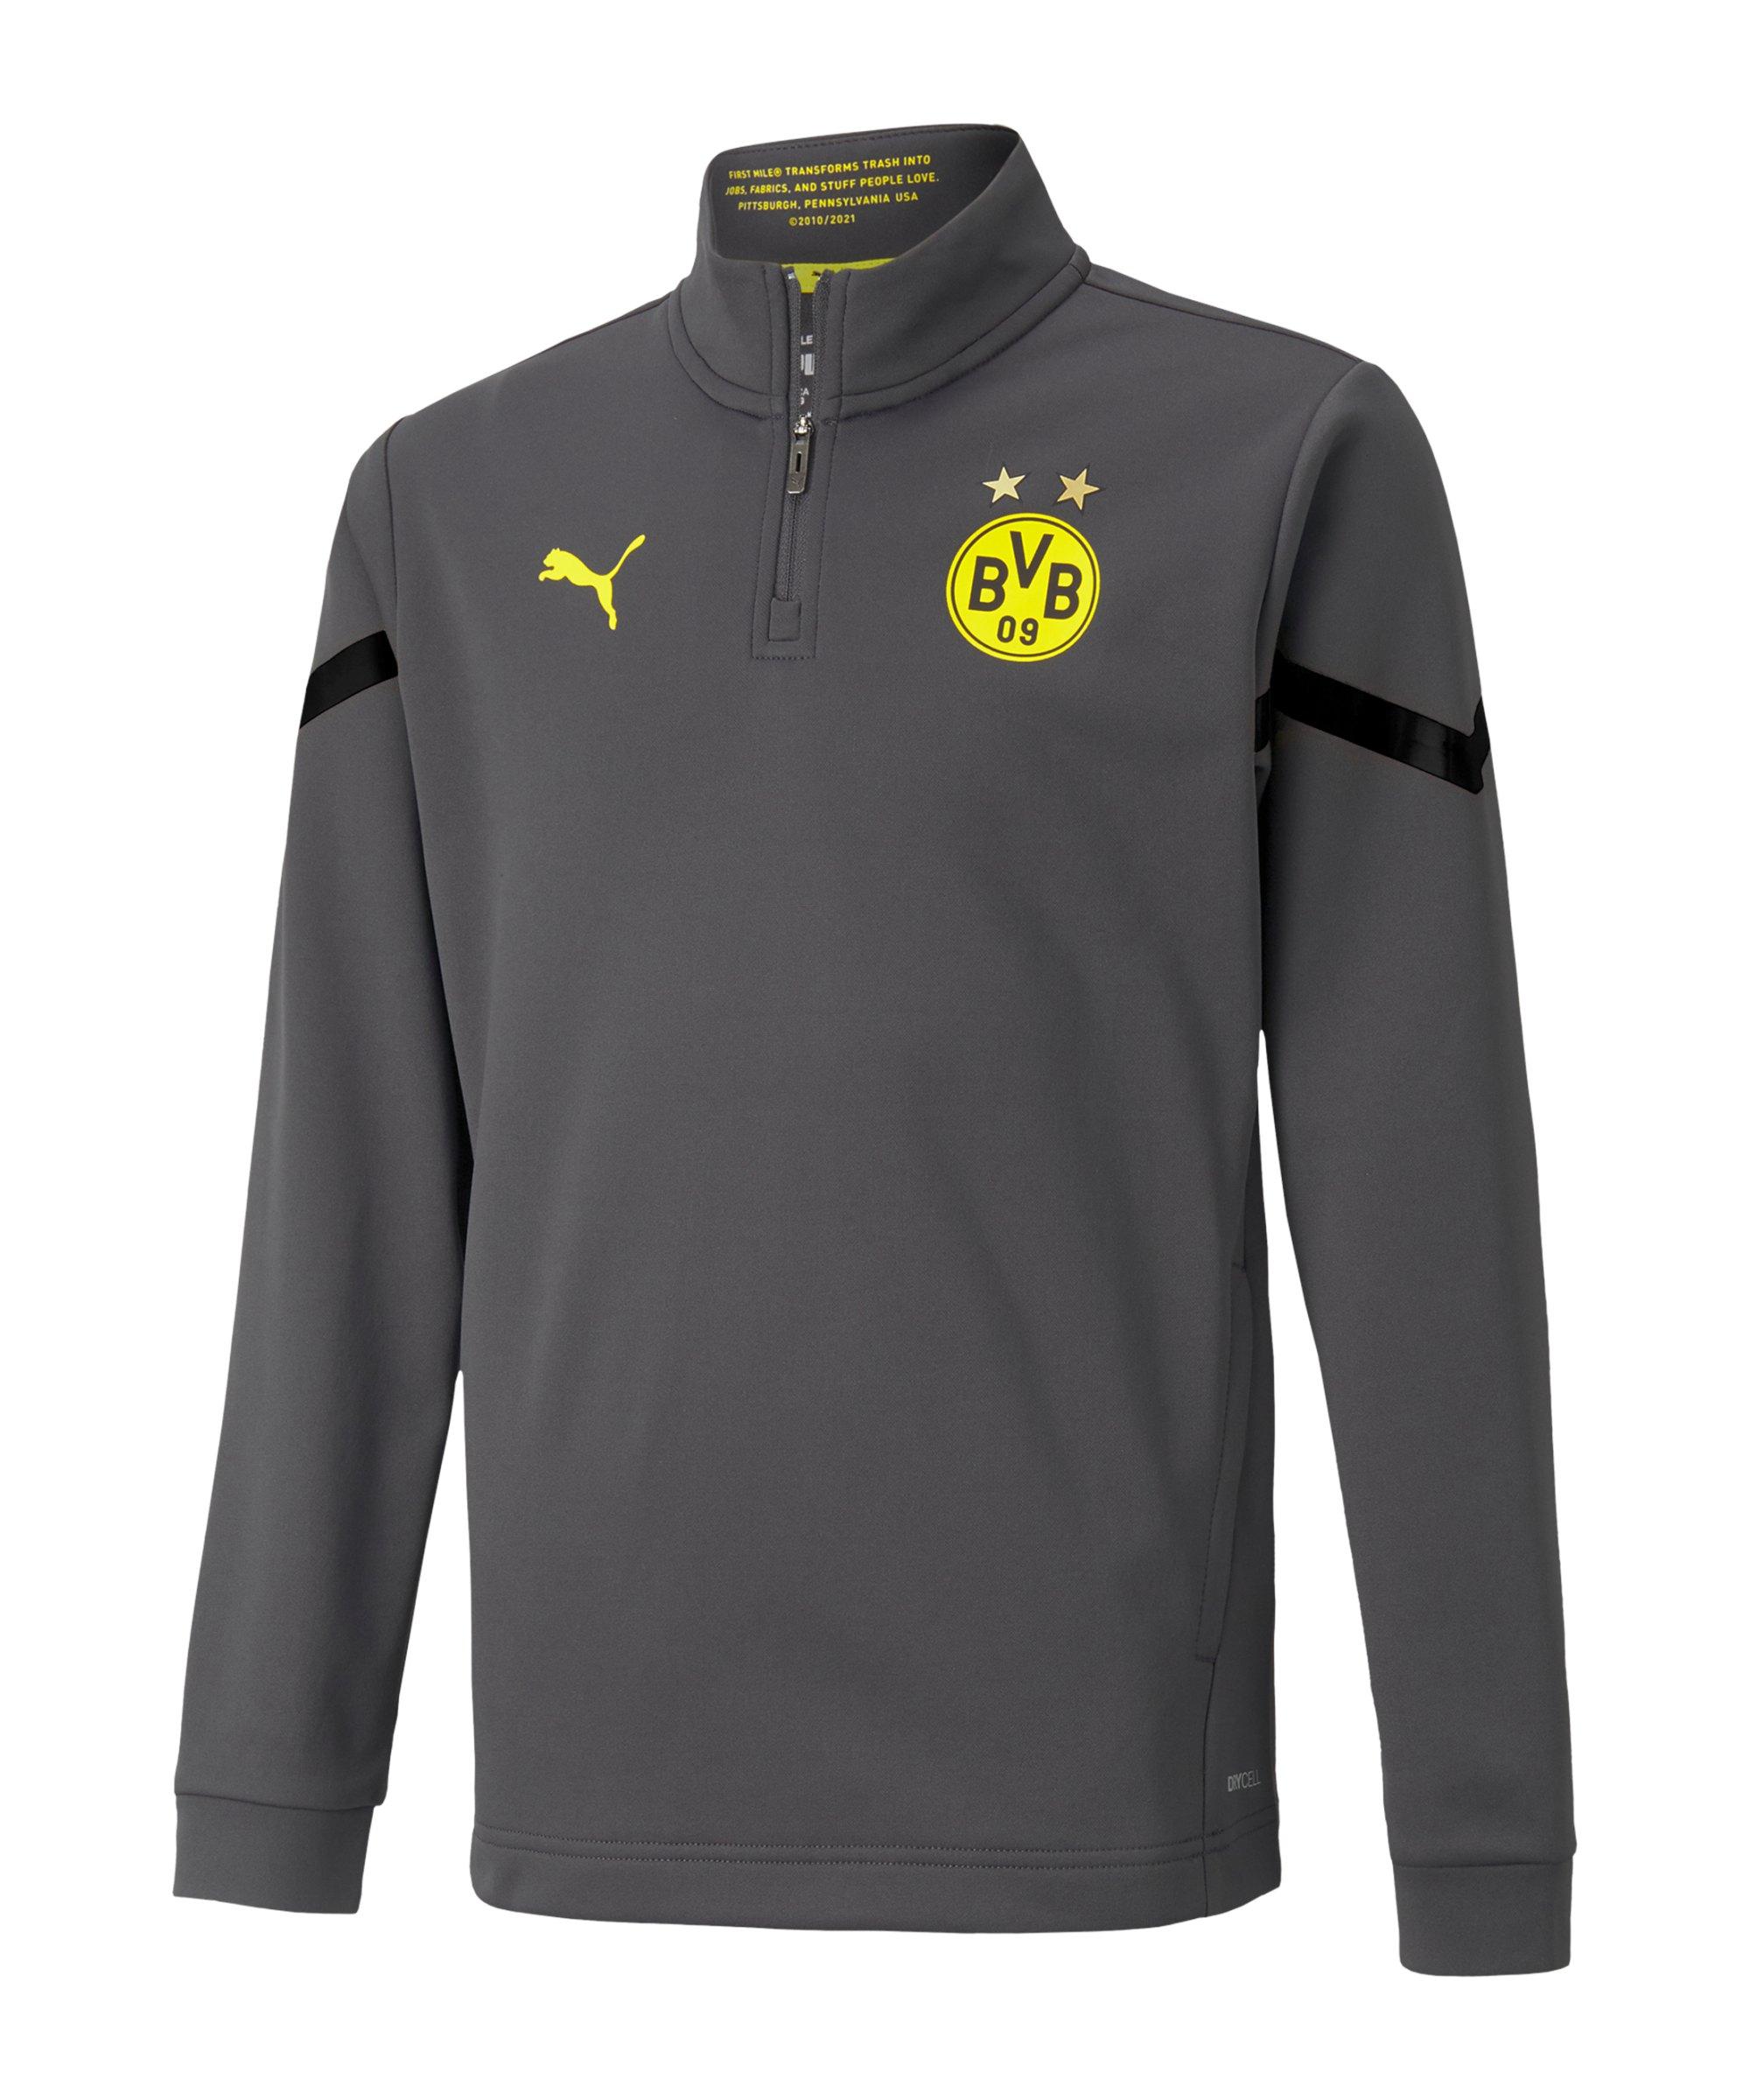 PUMA BVB Dortmund Prematch 1/4 Ziptop 2021/2022 Kids Grau F04 - grau